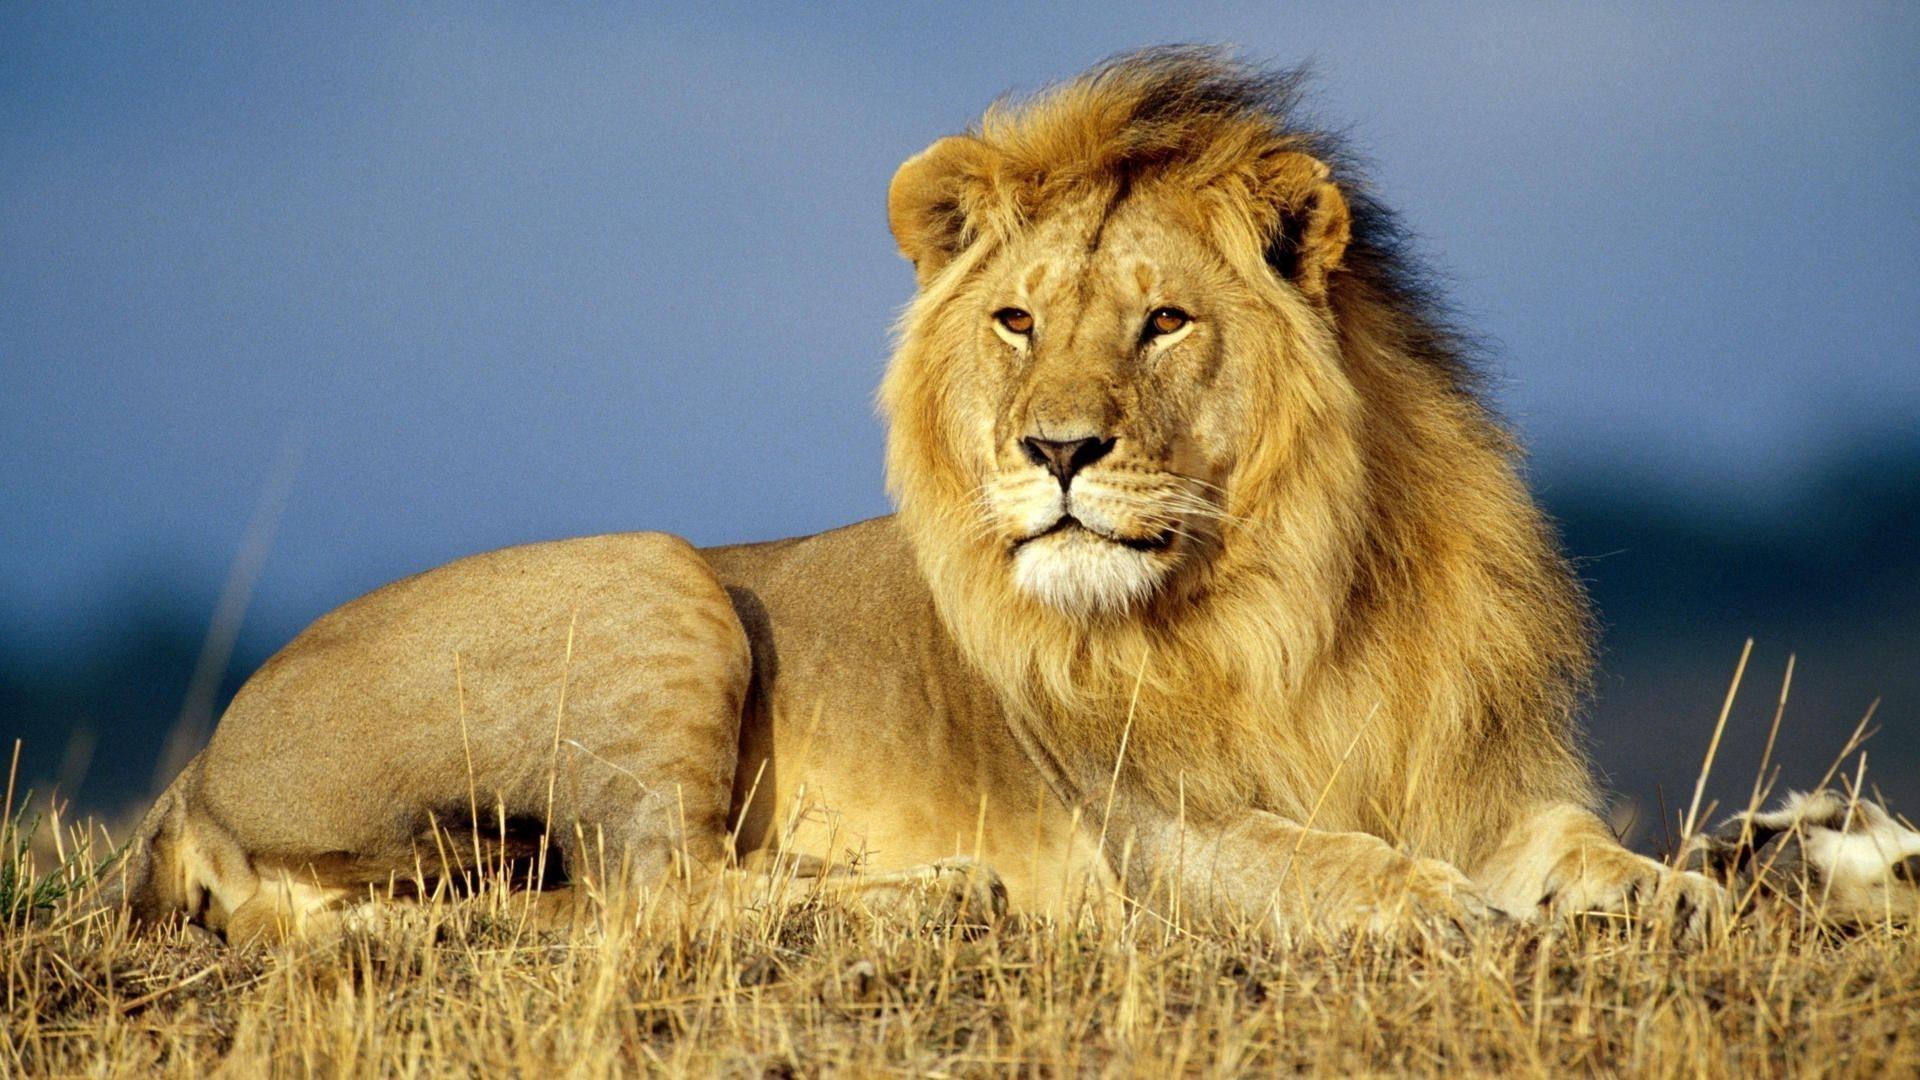 African Lion 1080p HD Wallpaper | Asian Lion | Pinterest | Lion ...